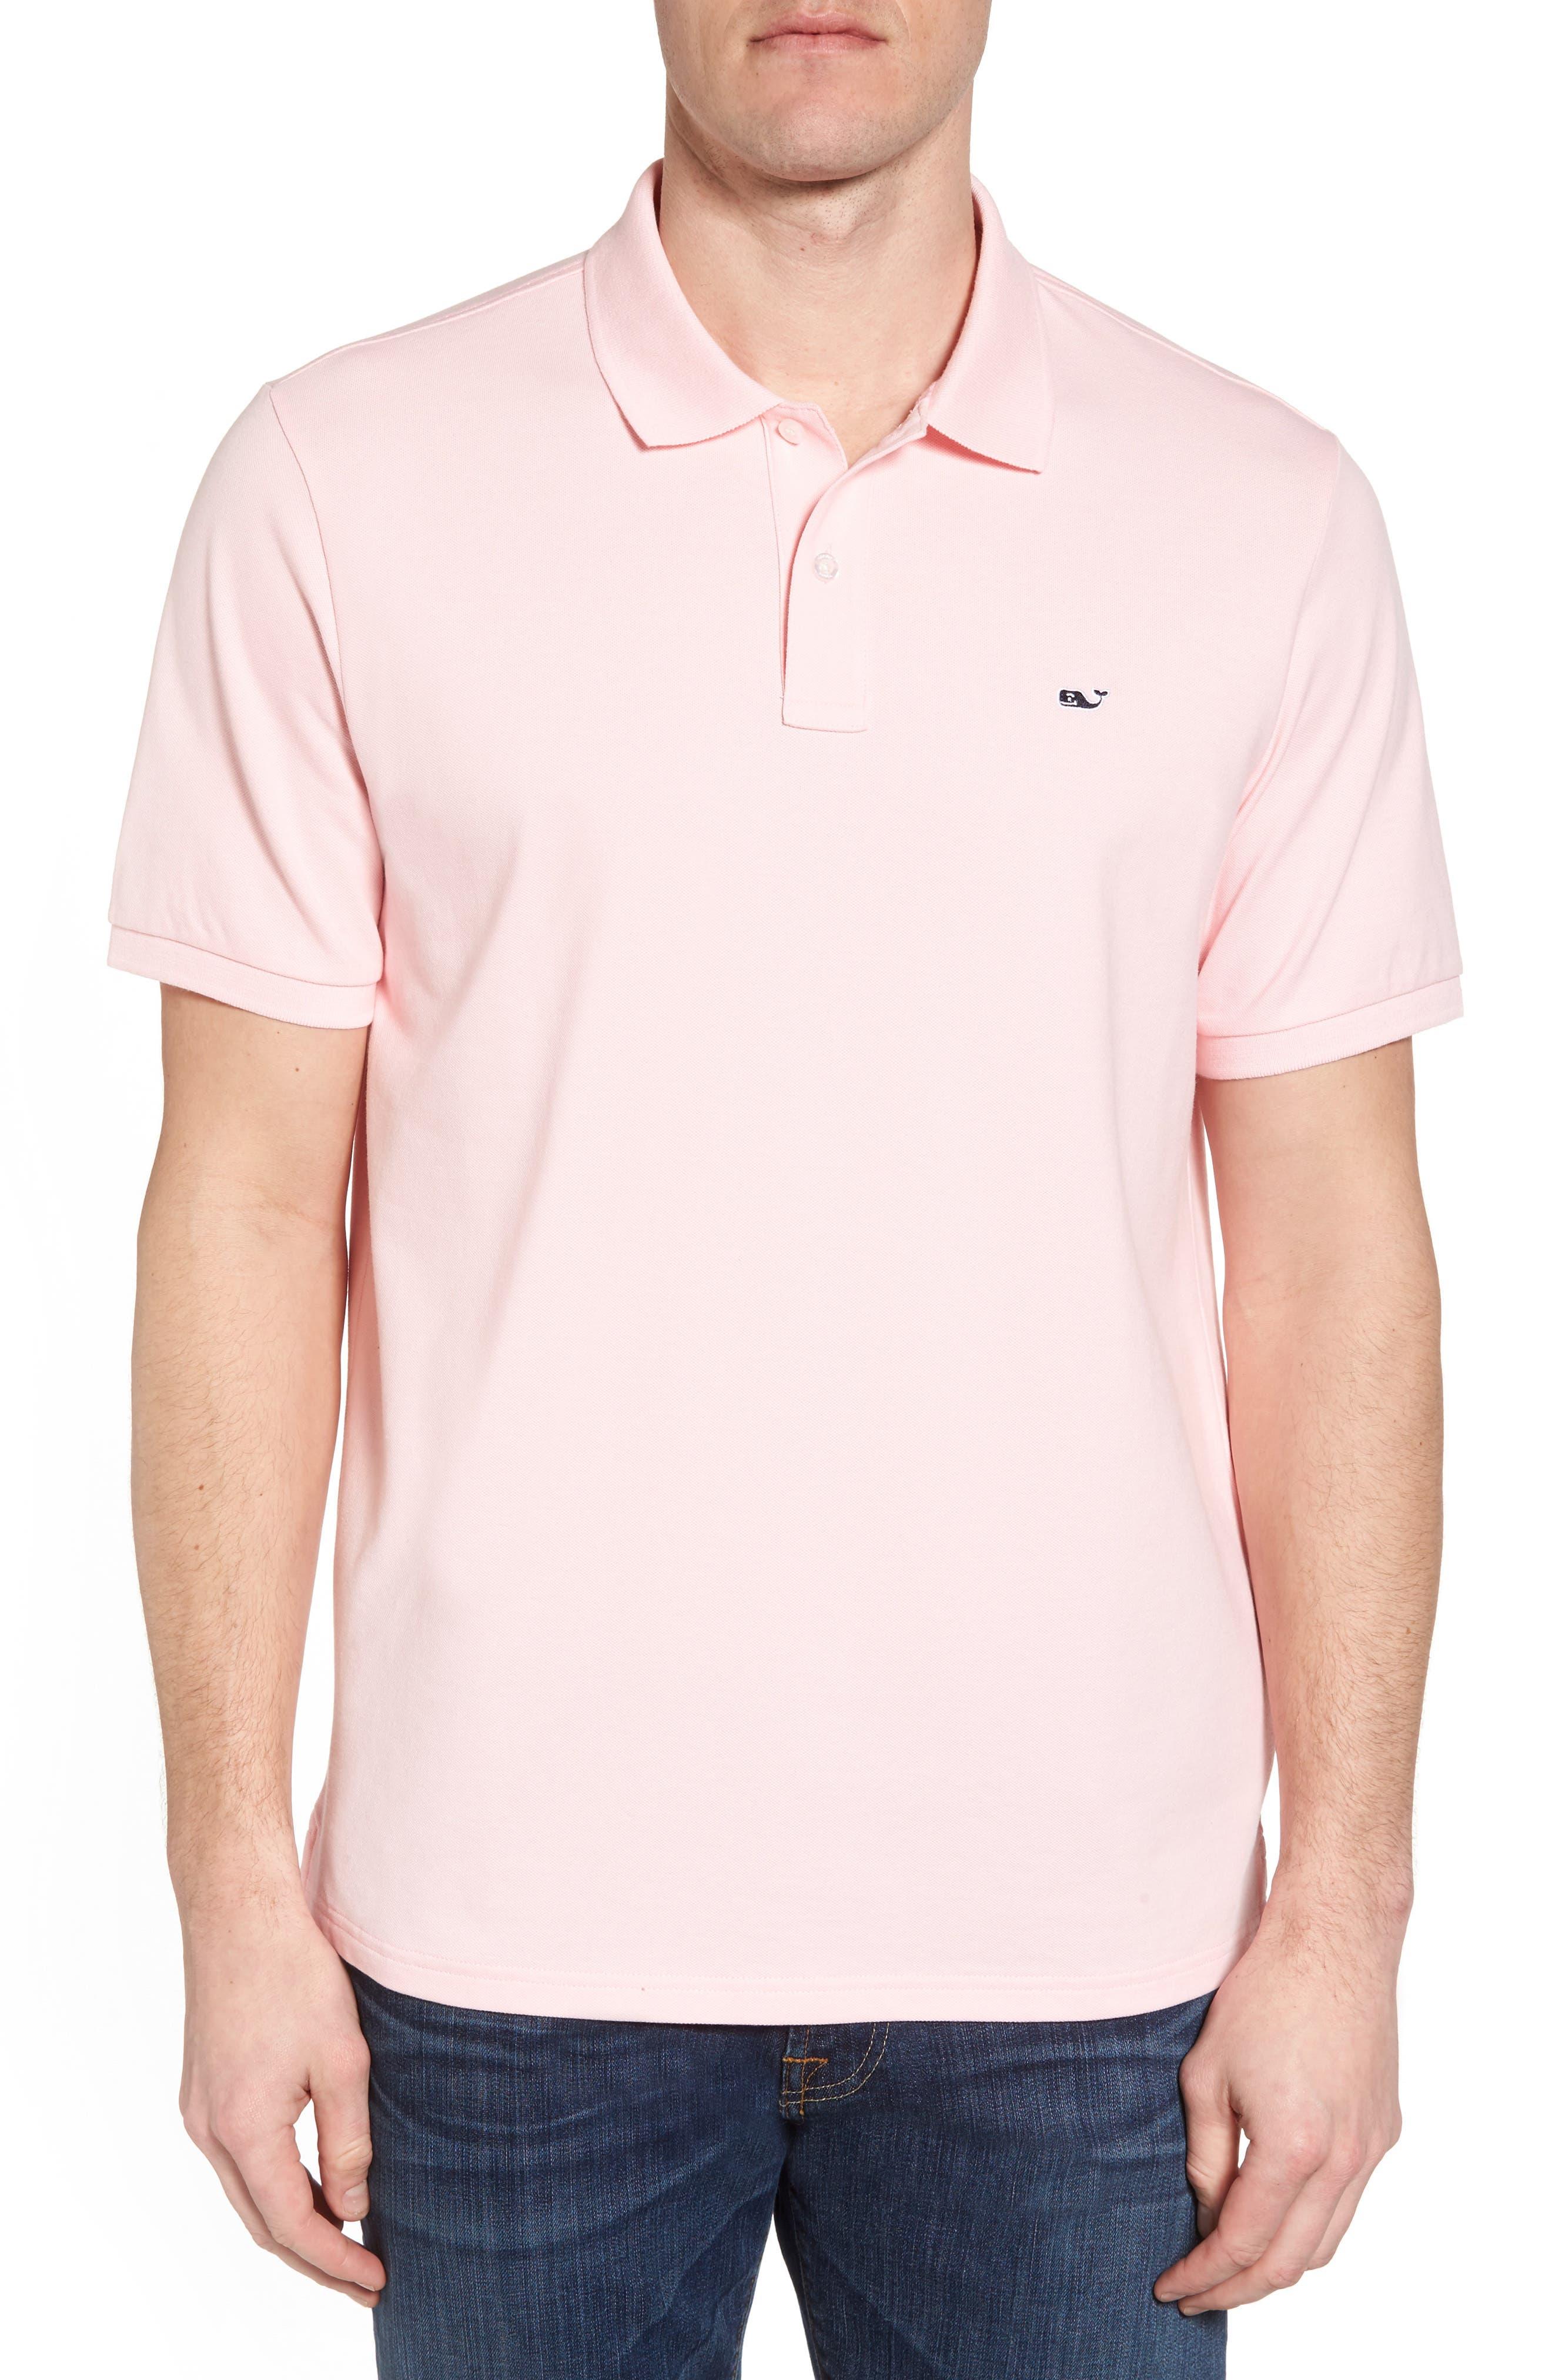 VINEYARD VINES Pique Regular Fit Polo Shirt in Flamingo